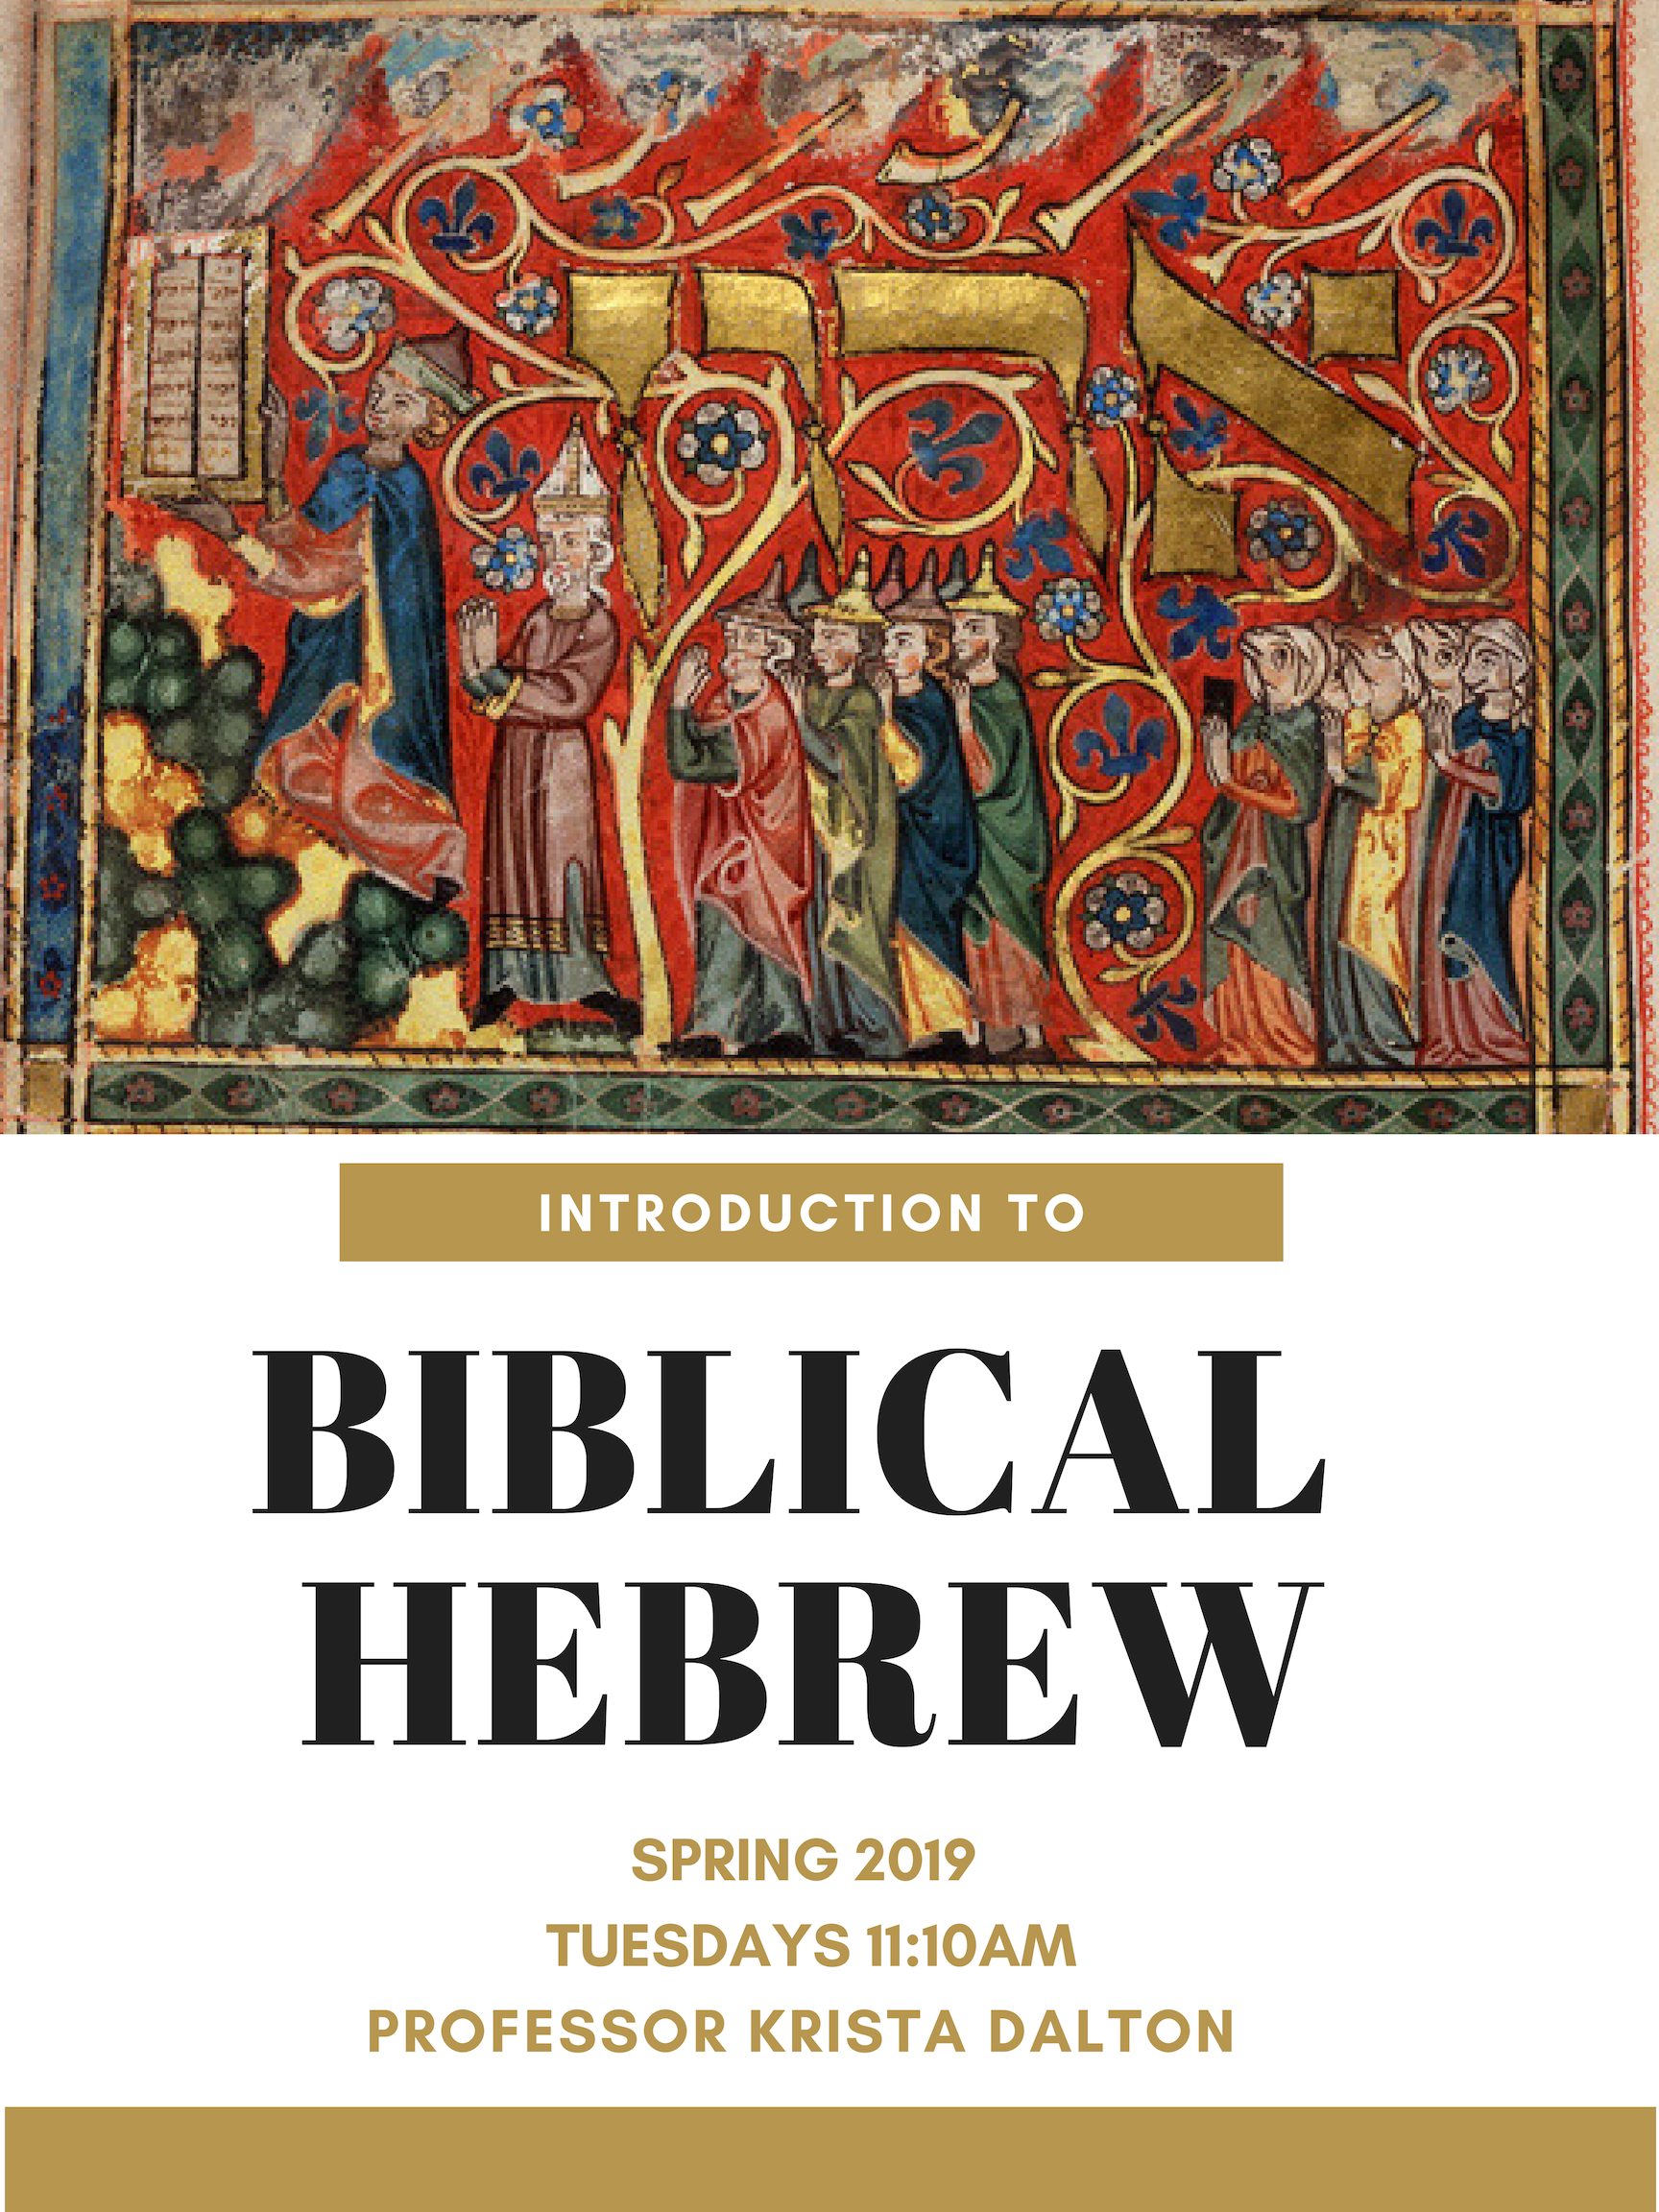 biblical hebrew.png